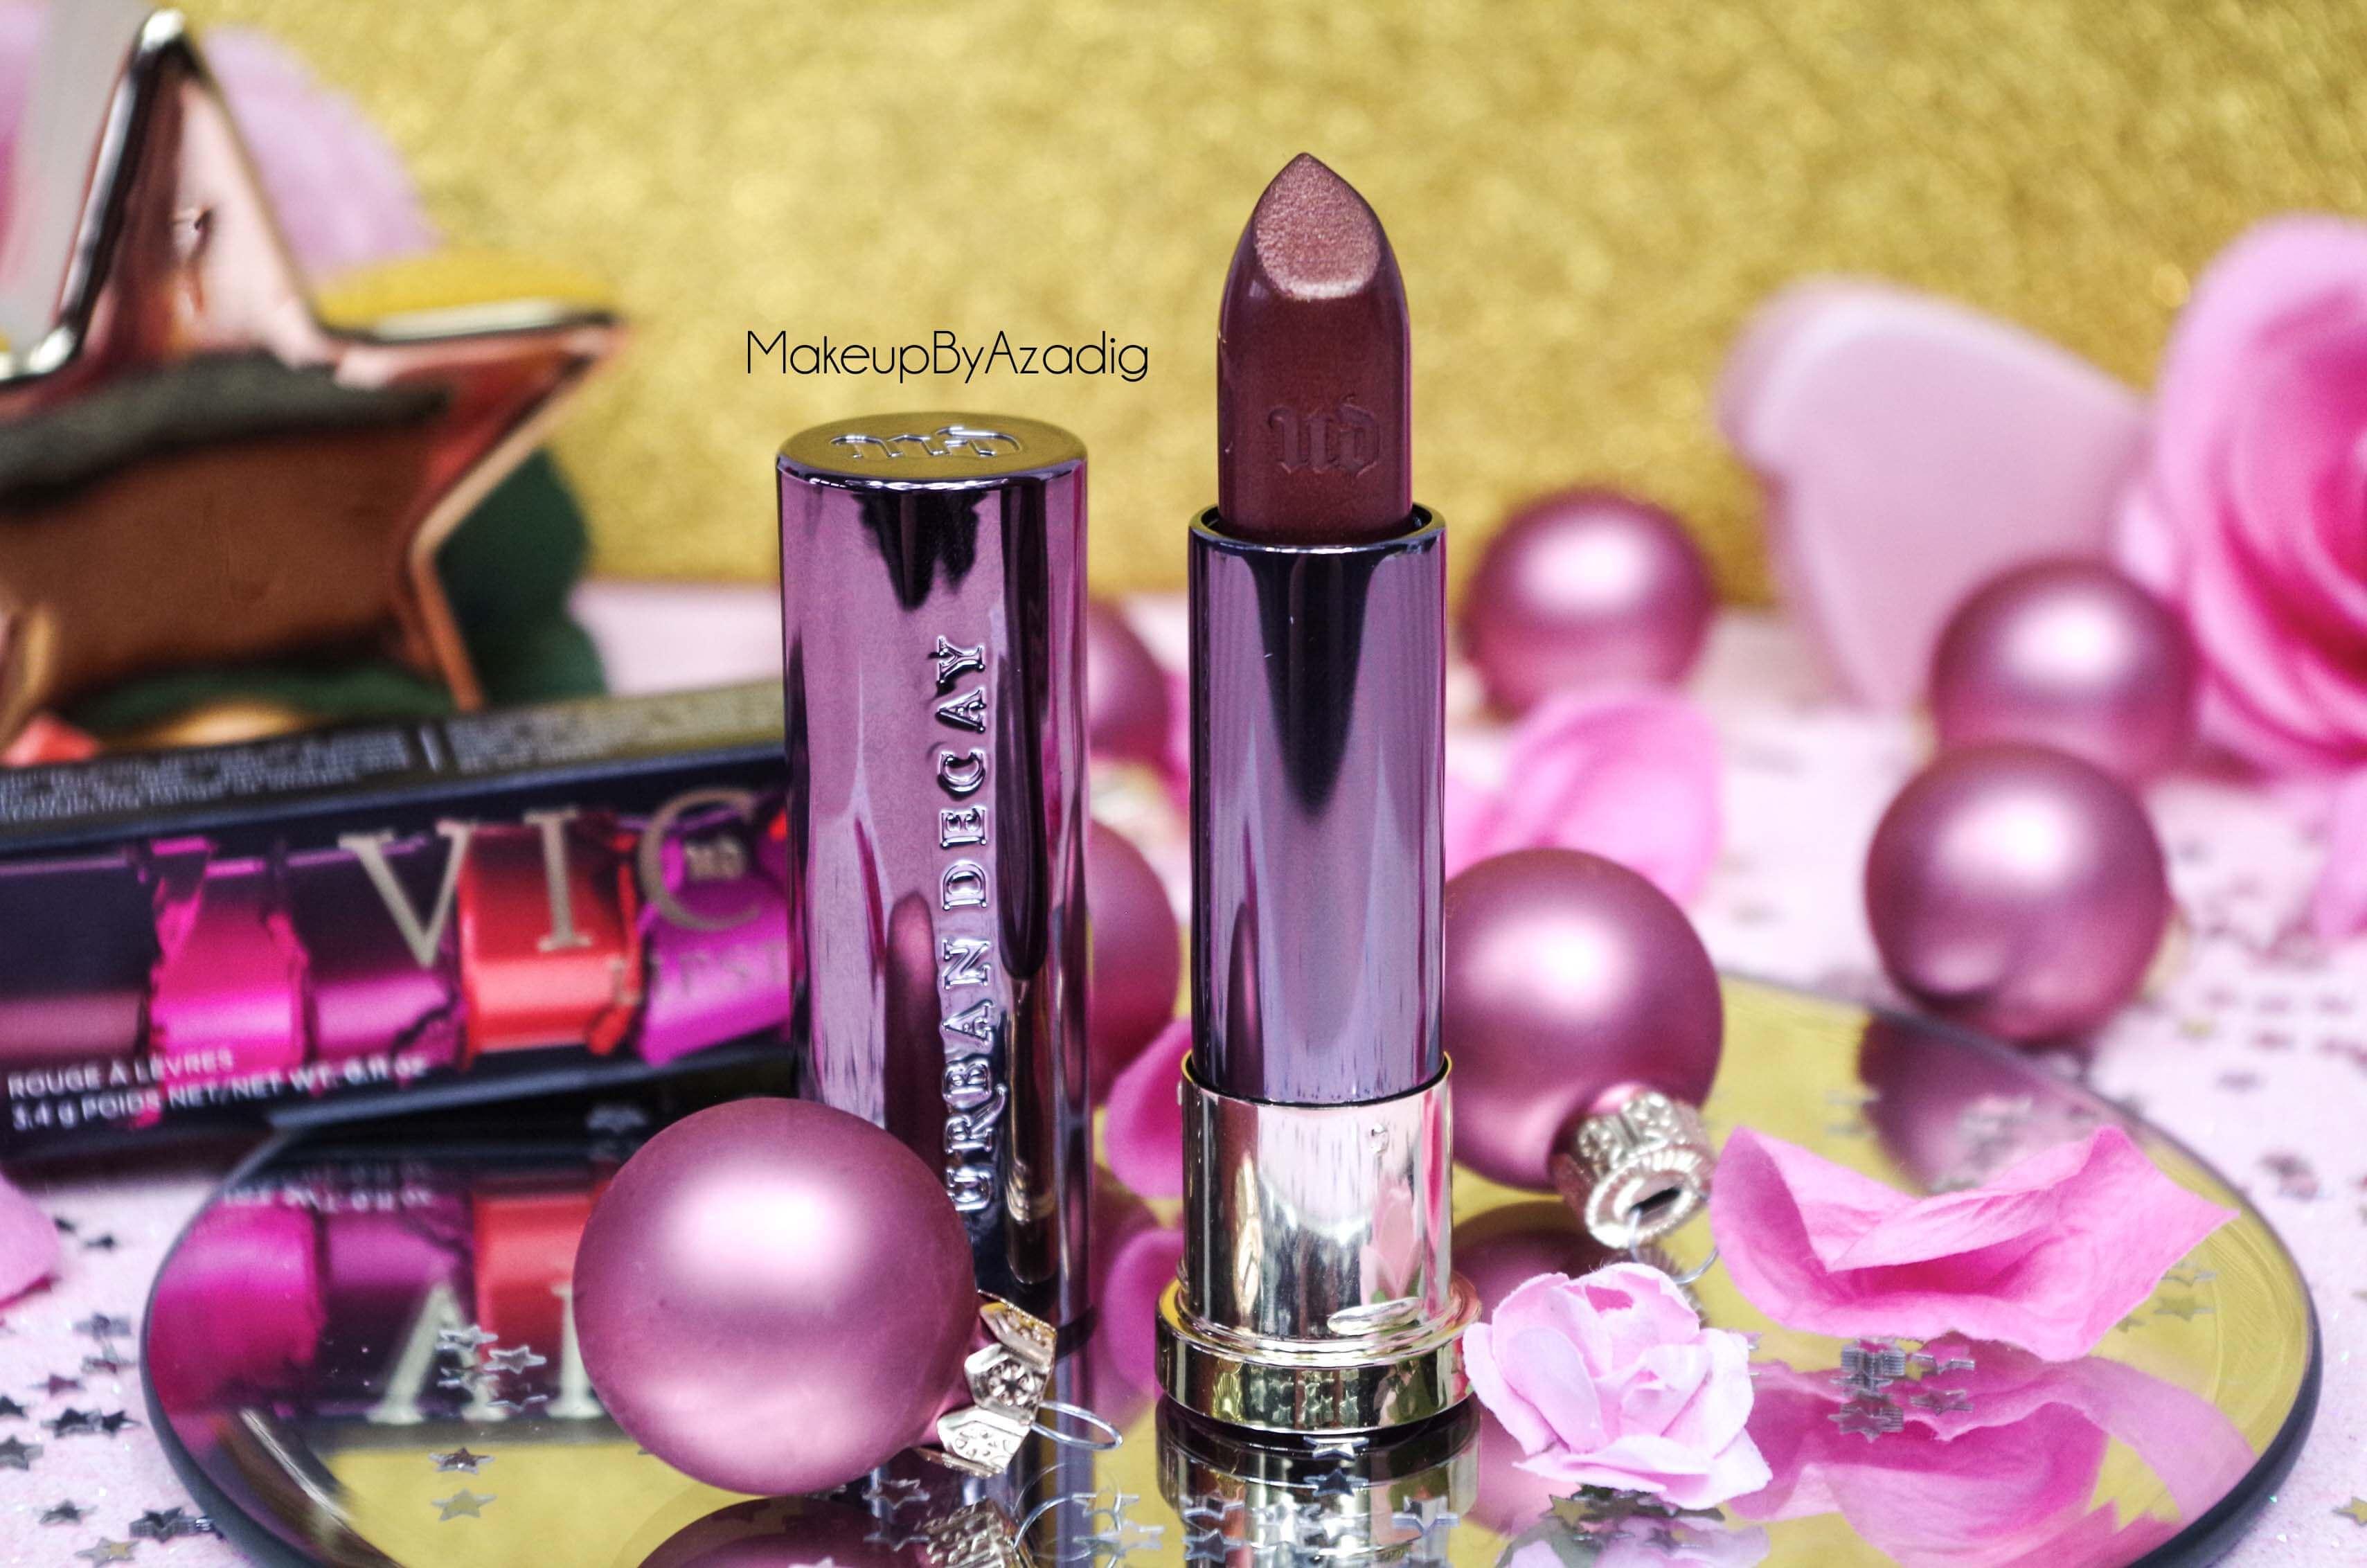 vice_lipstick_urban_decay_sephora_conspiracy_rouge_levre_fini_metallise_metallized_swatch_avis_prix_makeupbyazadig_revue-raisin